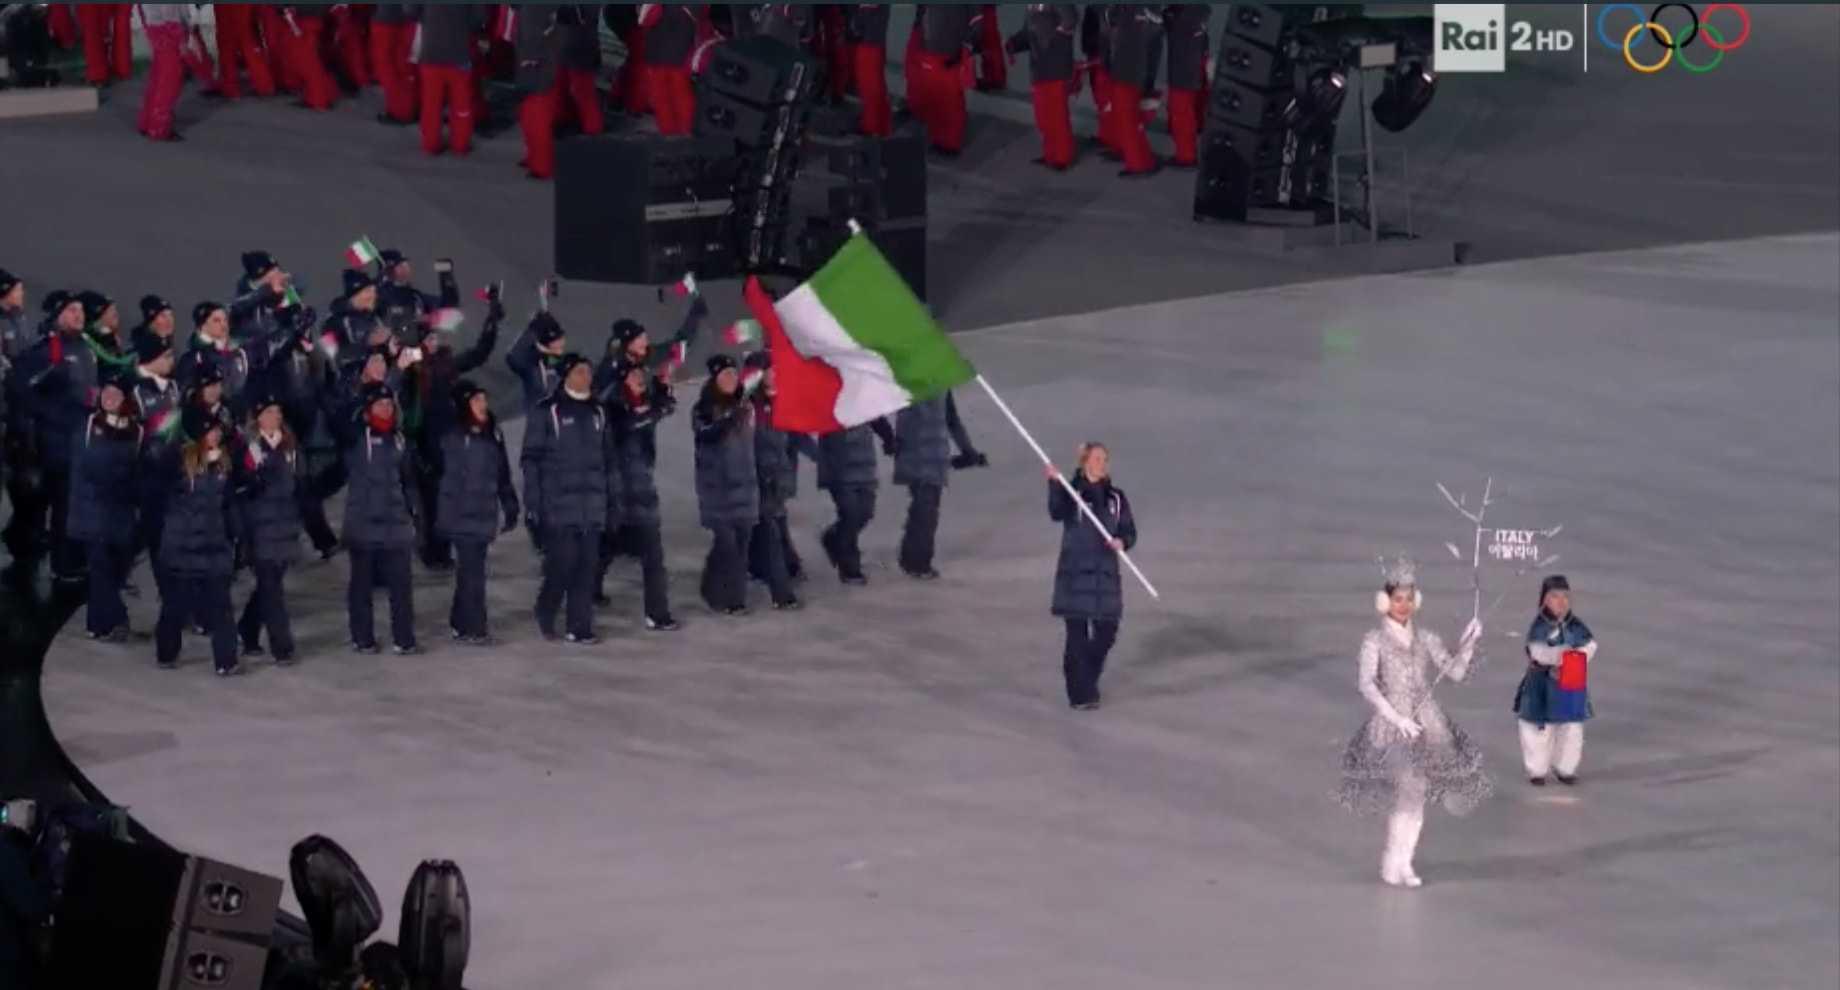 Pyeongchang 2018 la cerimonia d 39 apertura con arianna fontana for Xxiii giochi olimpici invernali di pyeongchang medaglie per paese